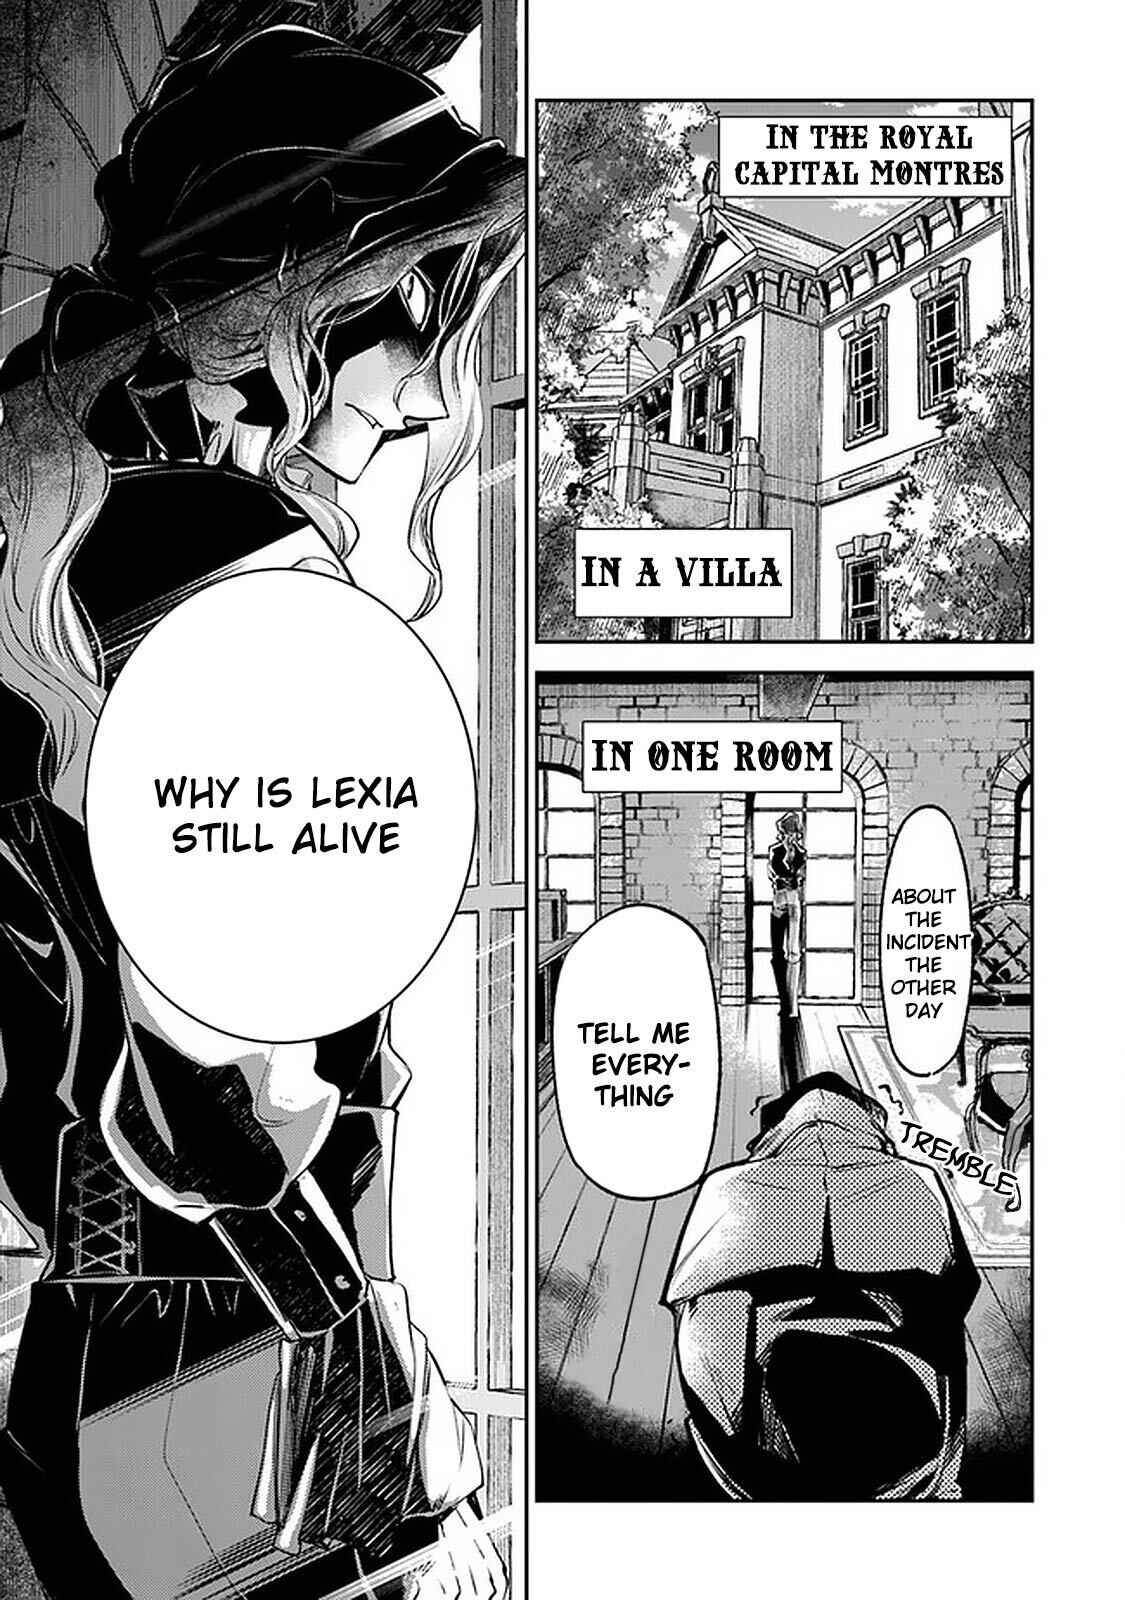 Isekai de Cheat Skill wo Te ni Shita Ore wa, Genjitsu Sekai wo mo Musou Suru ~Level Up wa Jinsei wo Kaeta~ - chapter 9-2-eng-li